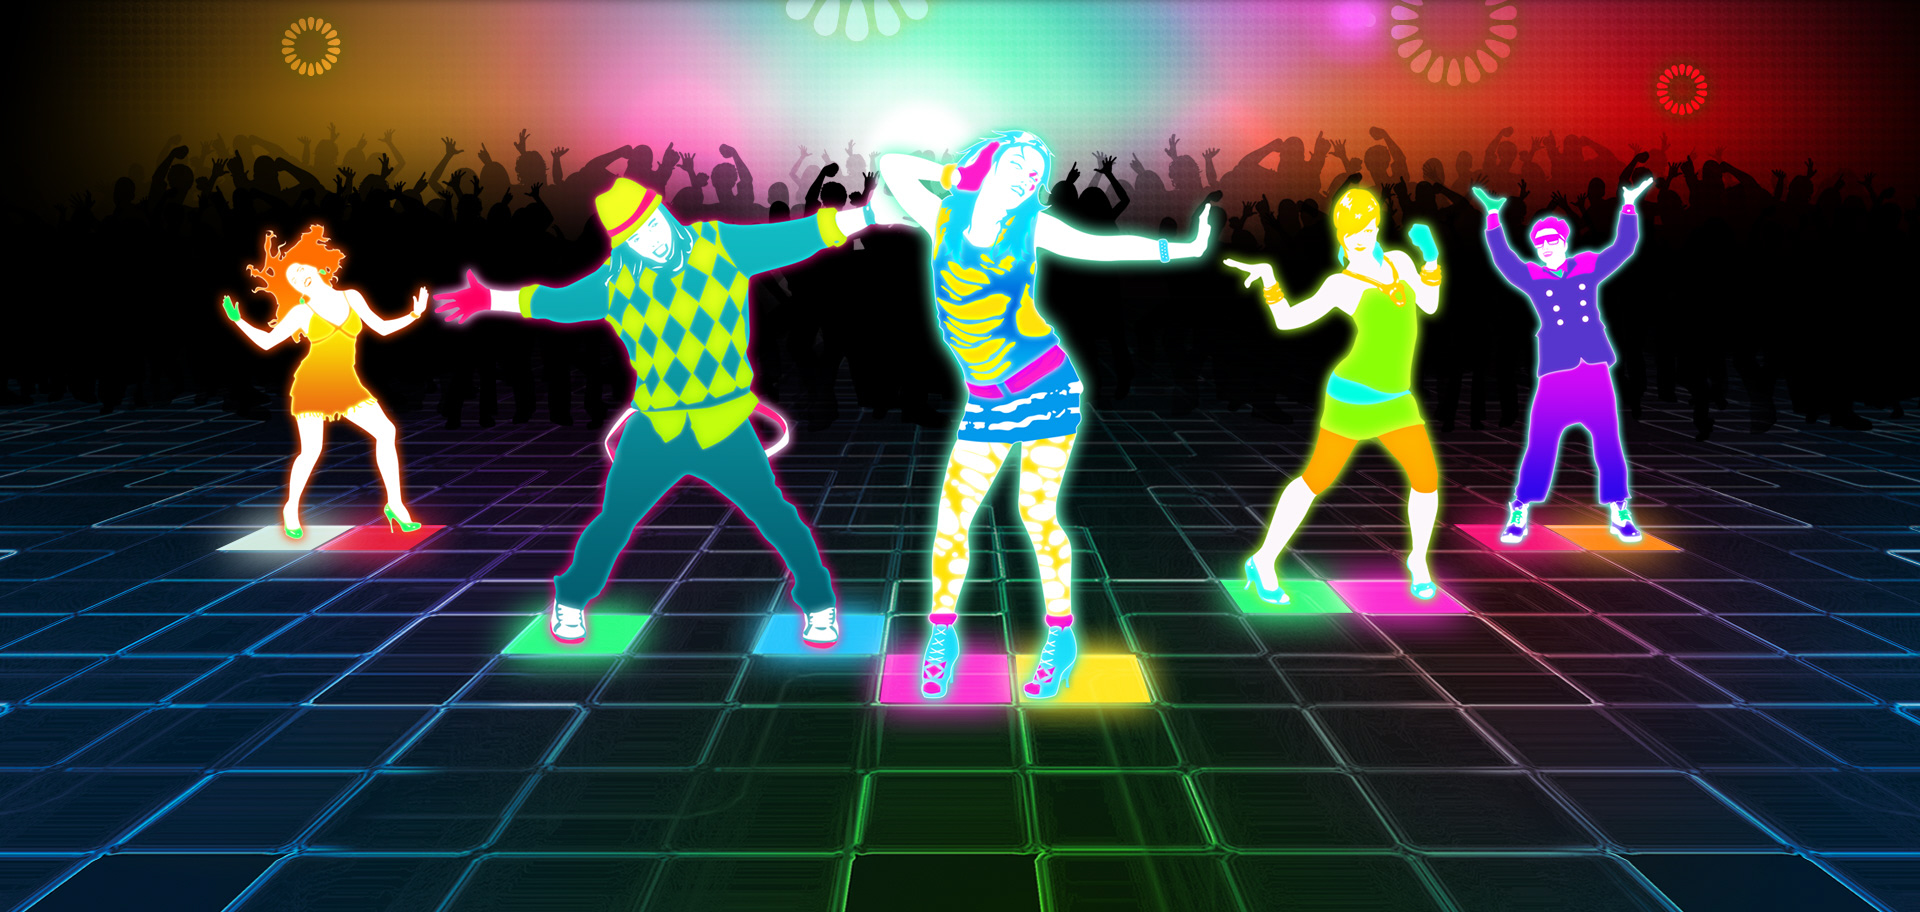 just-dance-3-co-op-wallpaper-1920x1200.jpg